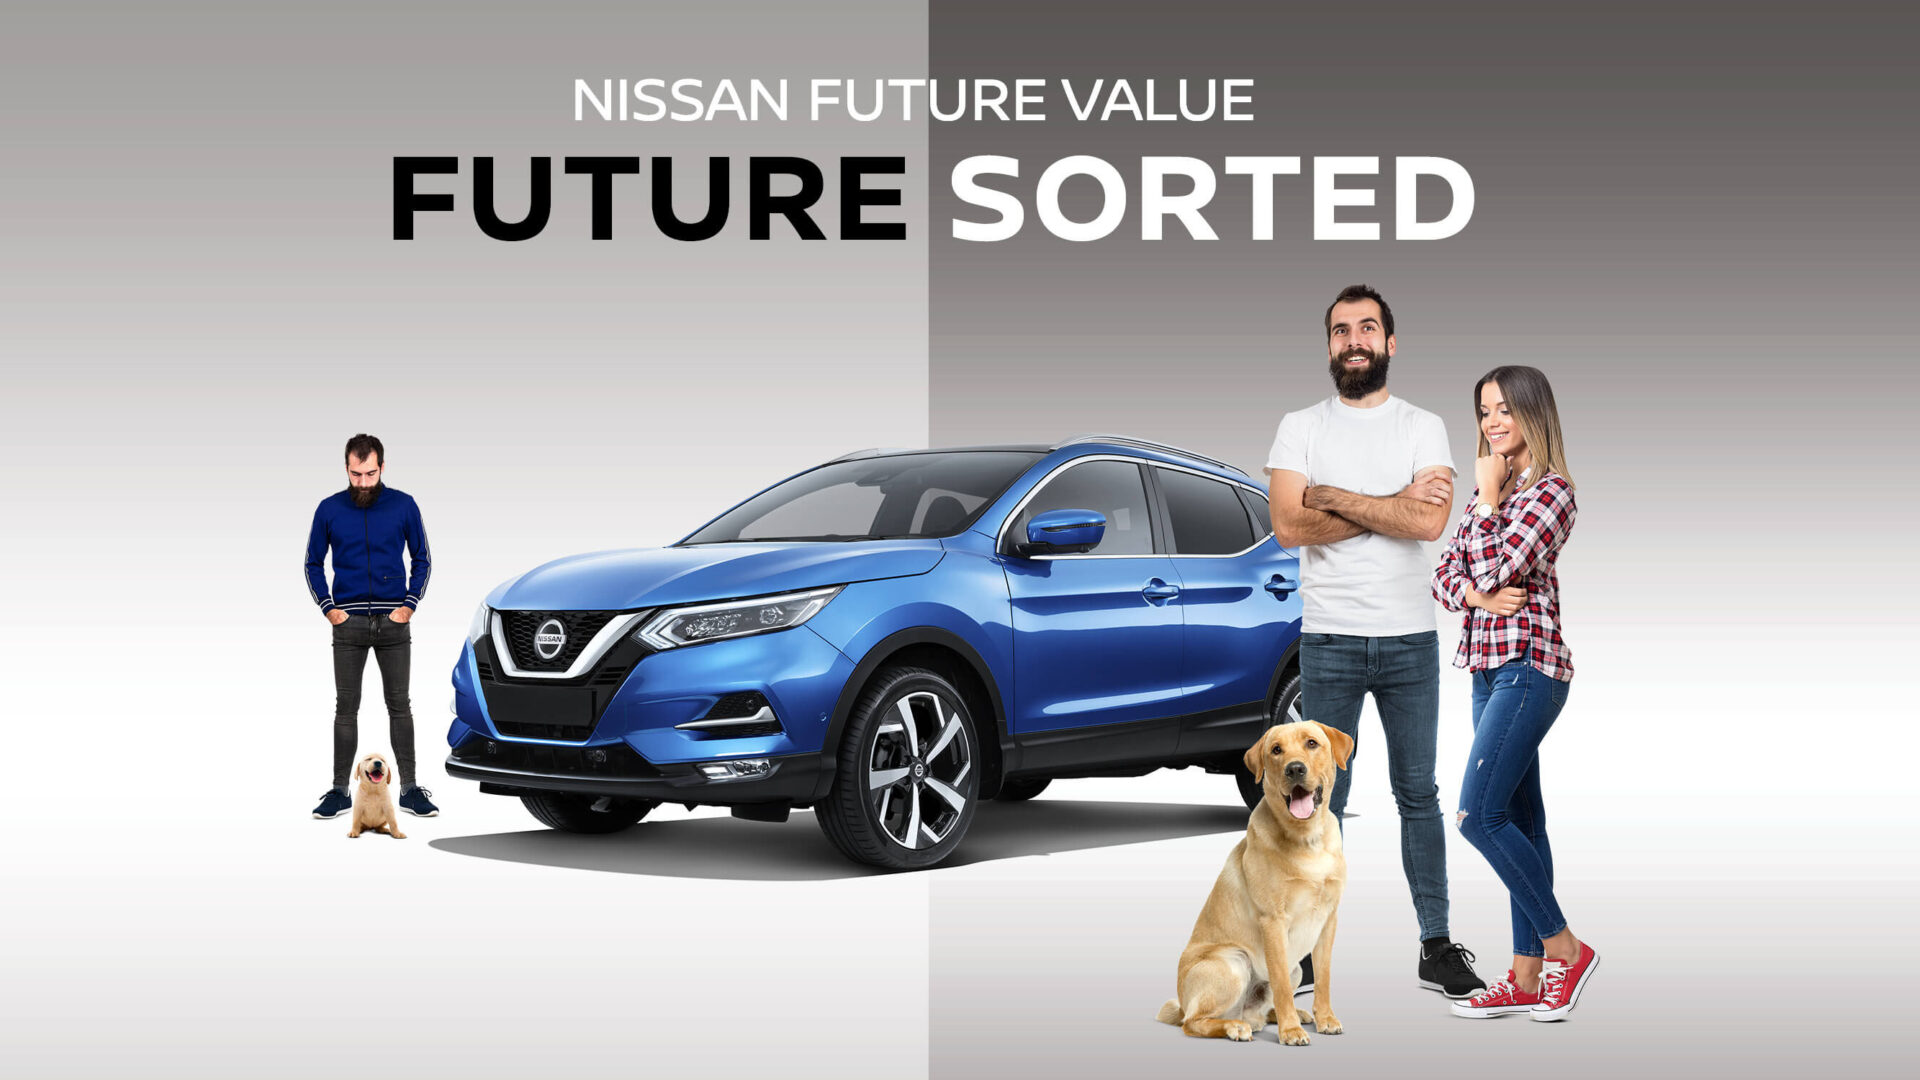 Nissan-Future-Value-Image